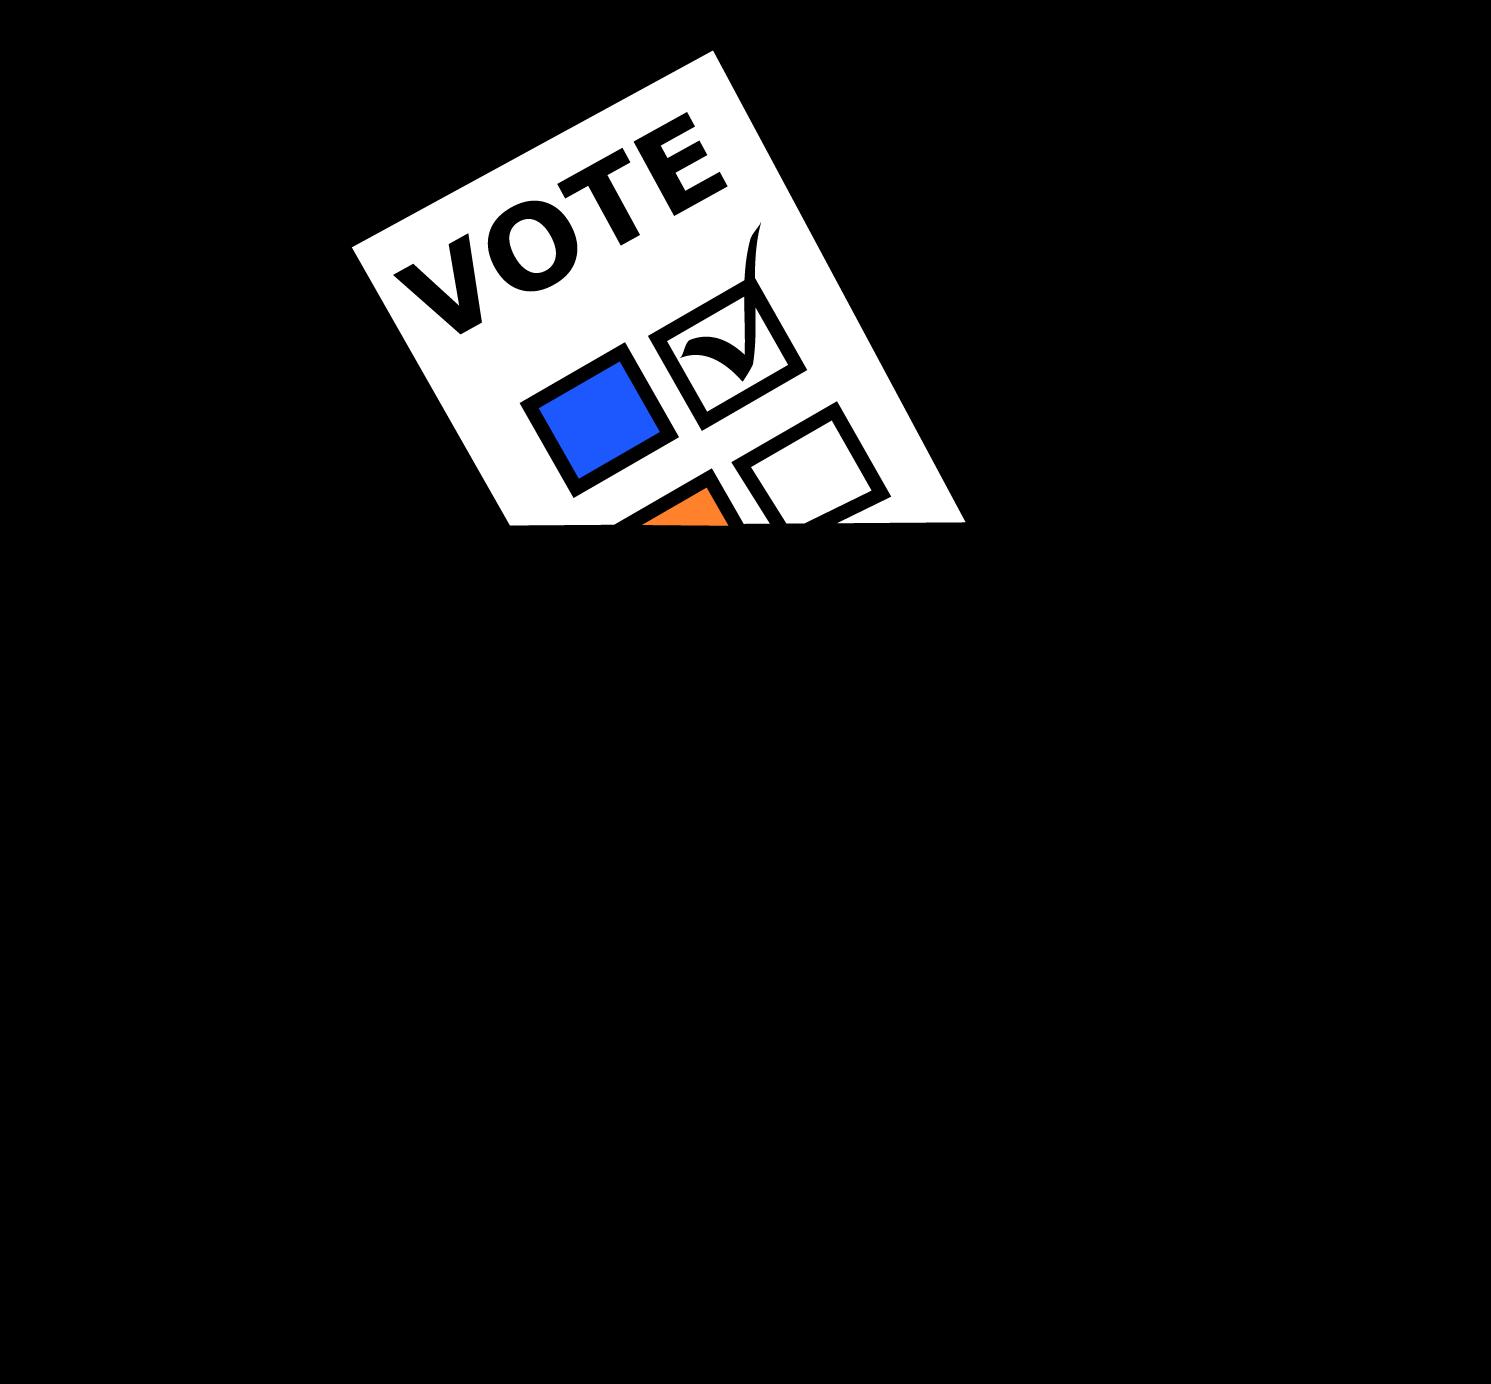 Voting clipart reform. If eight polls run